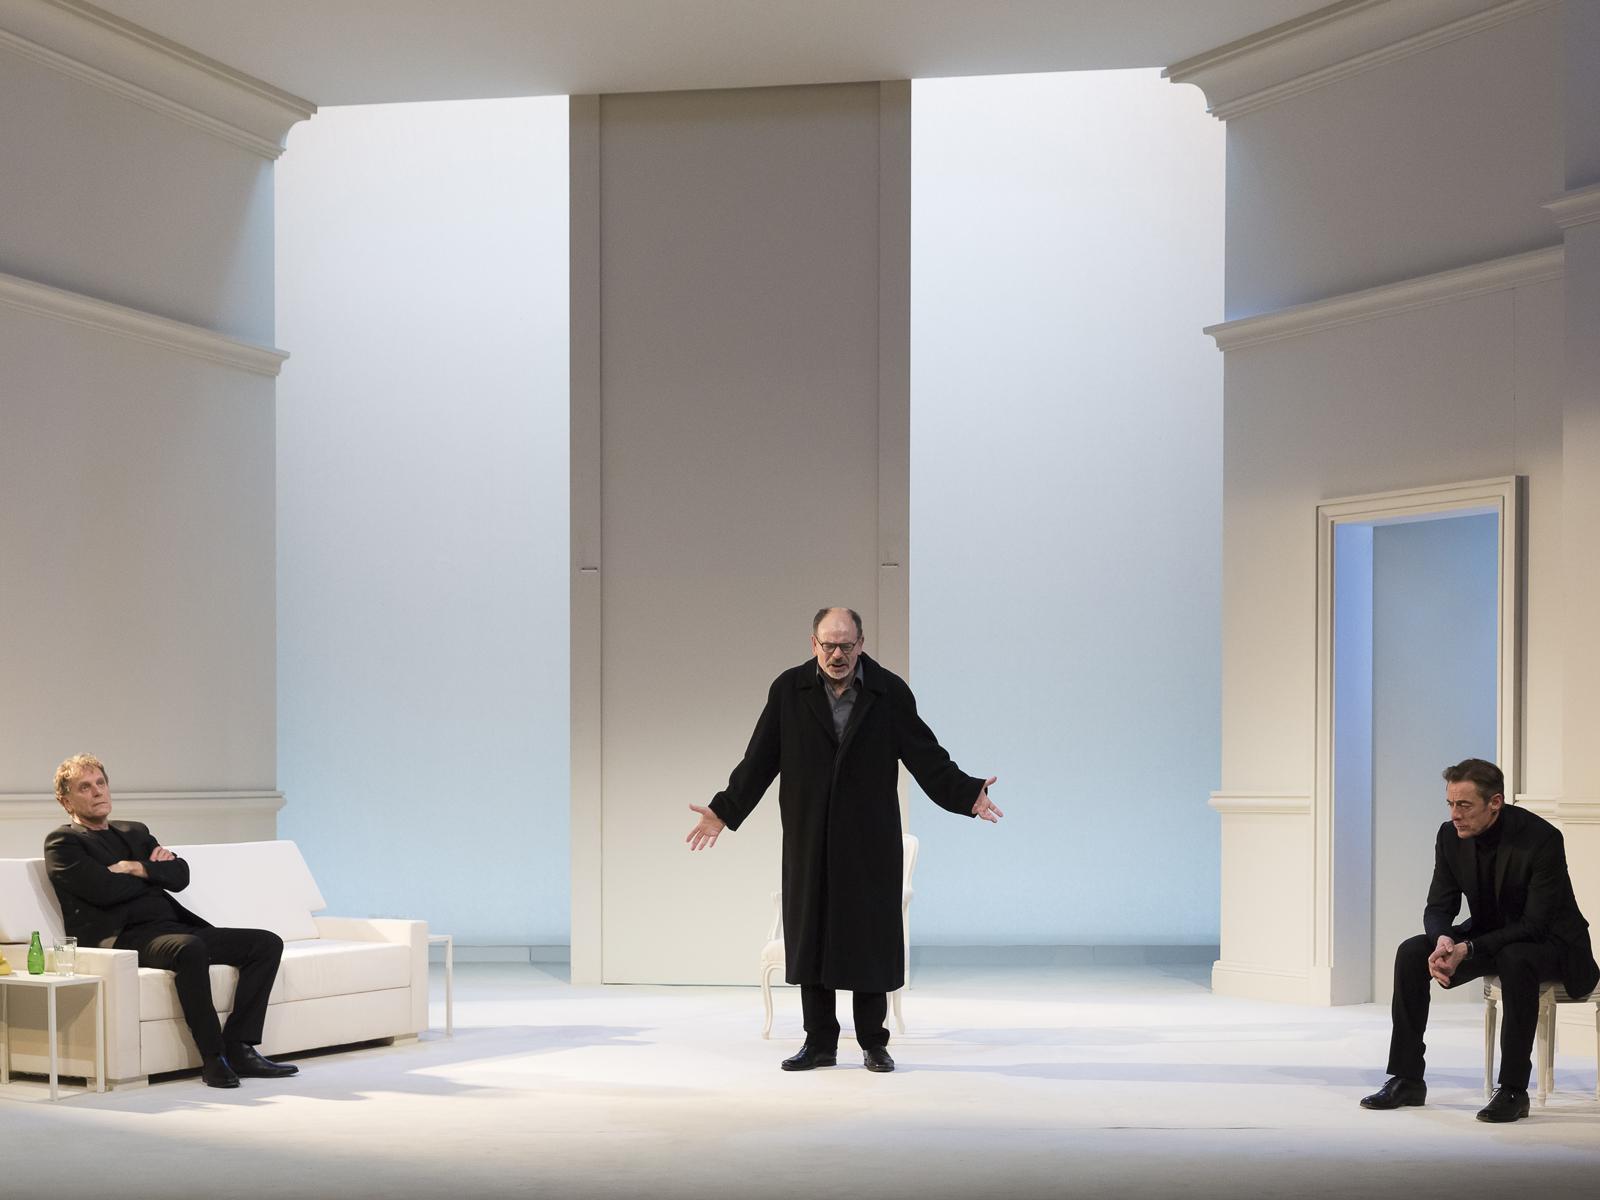 toulon-provence-mediterranee-culture-theatre-liberte-toulon.Art-Svend-Andersen